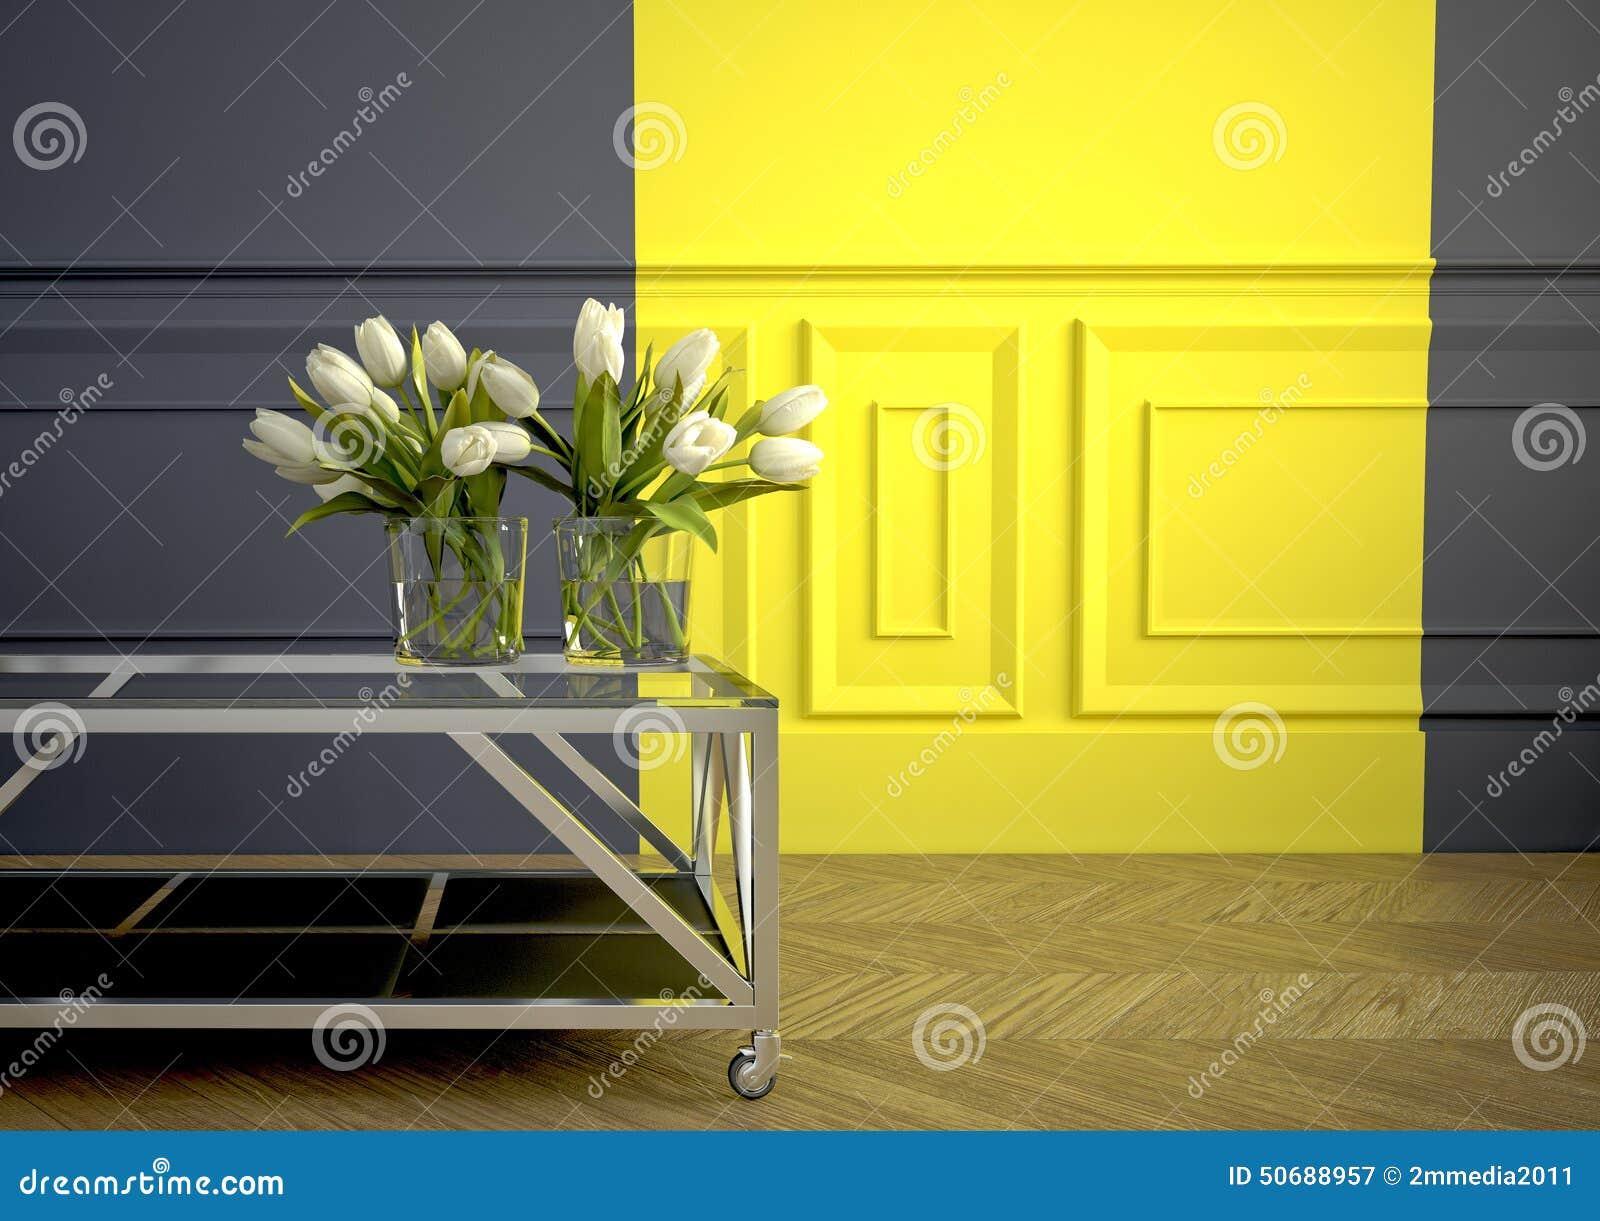 Download 白色郁金香春天花束  3d翻译 库存图片. 图片 包括有 绿色, 言情, 自然, 存在, 花束, 粉红色 - 50688957